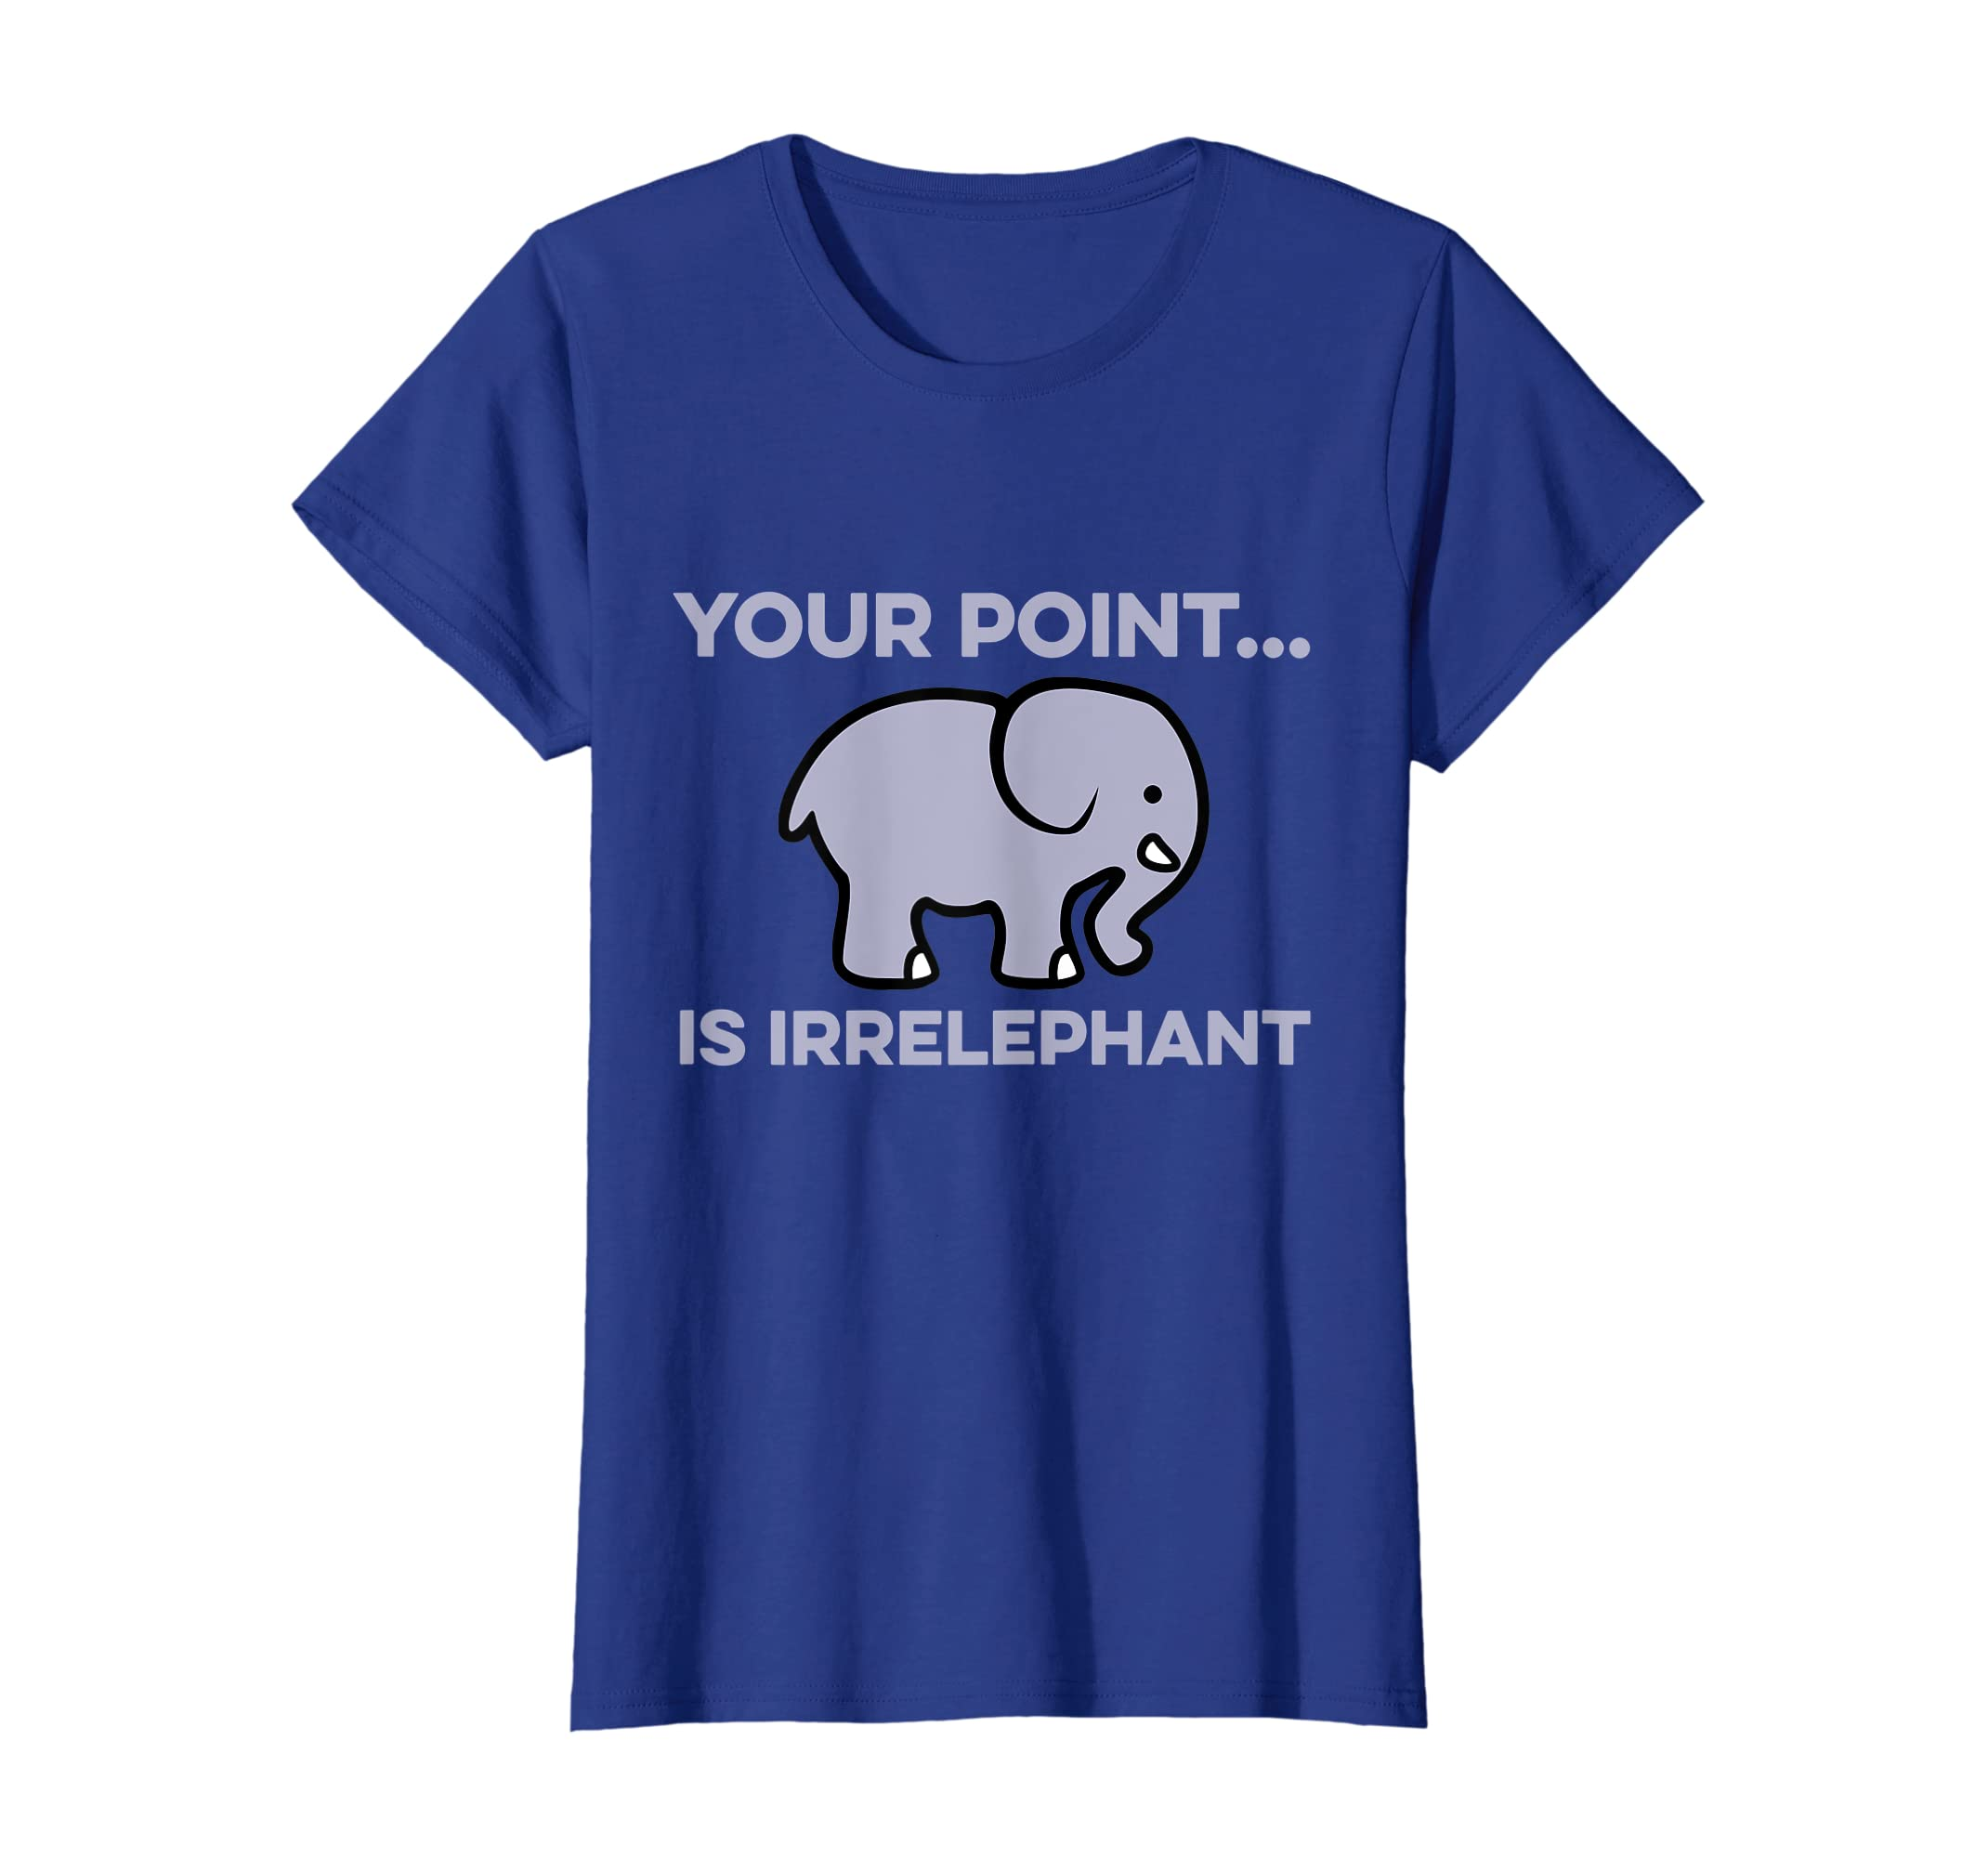 e725781b Amazon.com: Your Point Is Irrelephant T-Shirt - Elephant Pun Cute Tee:  Clothing